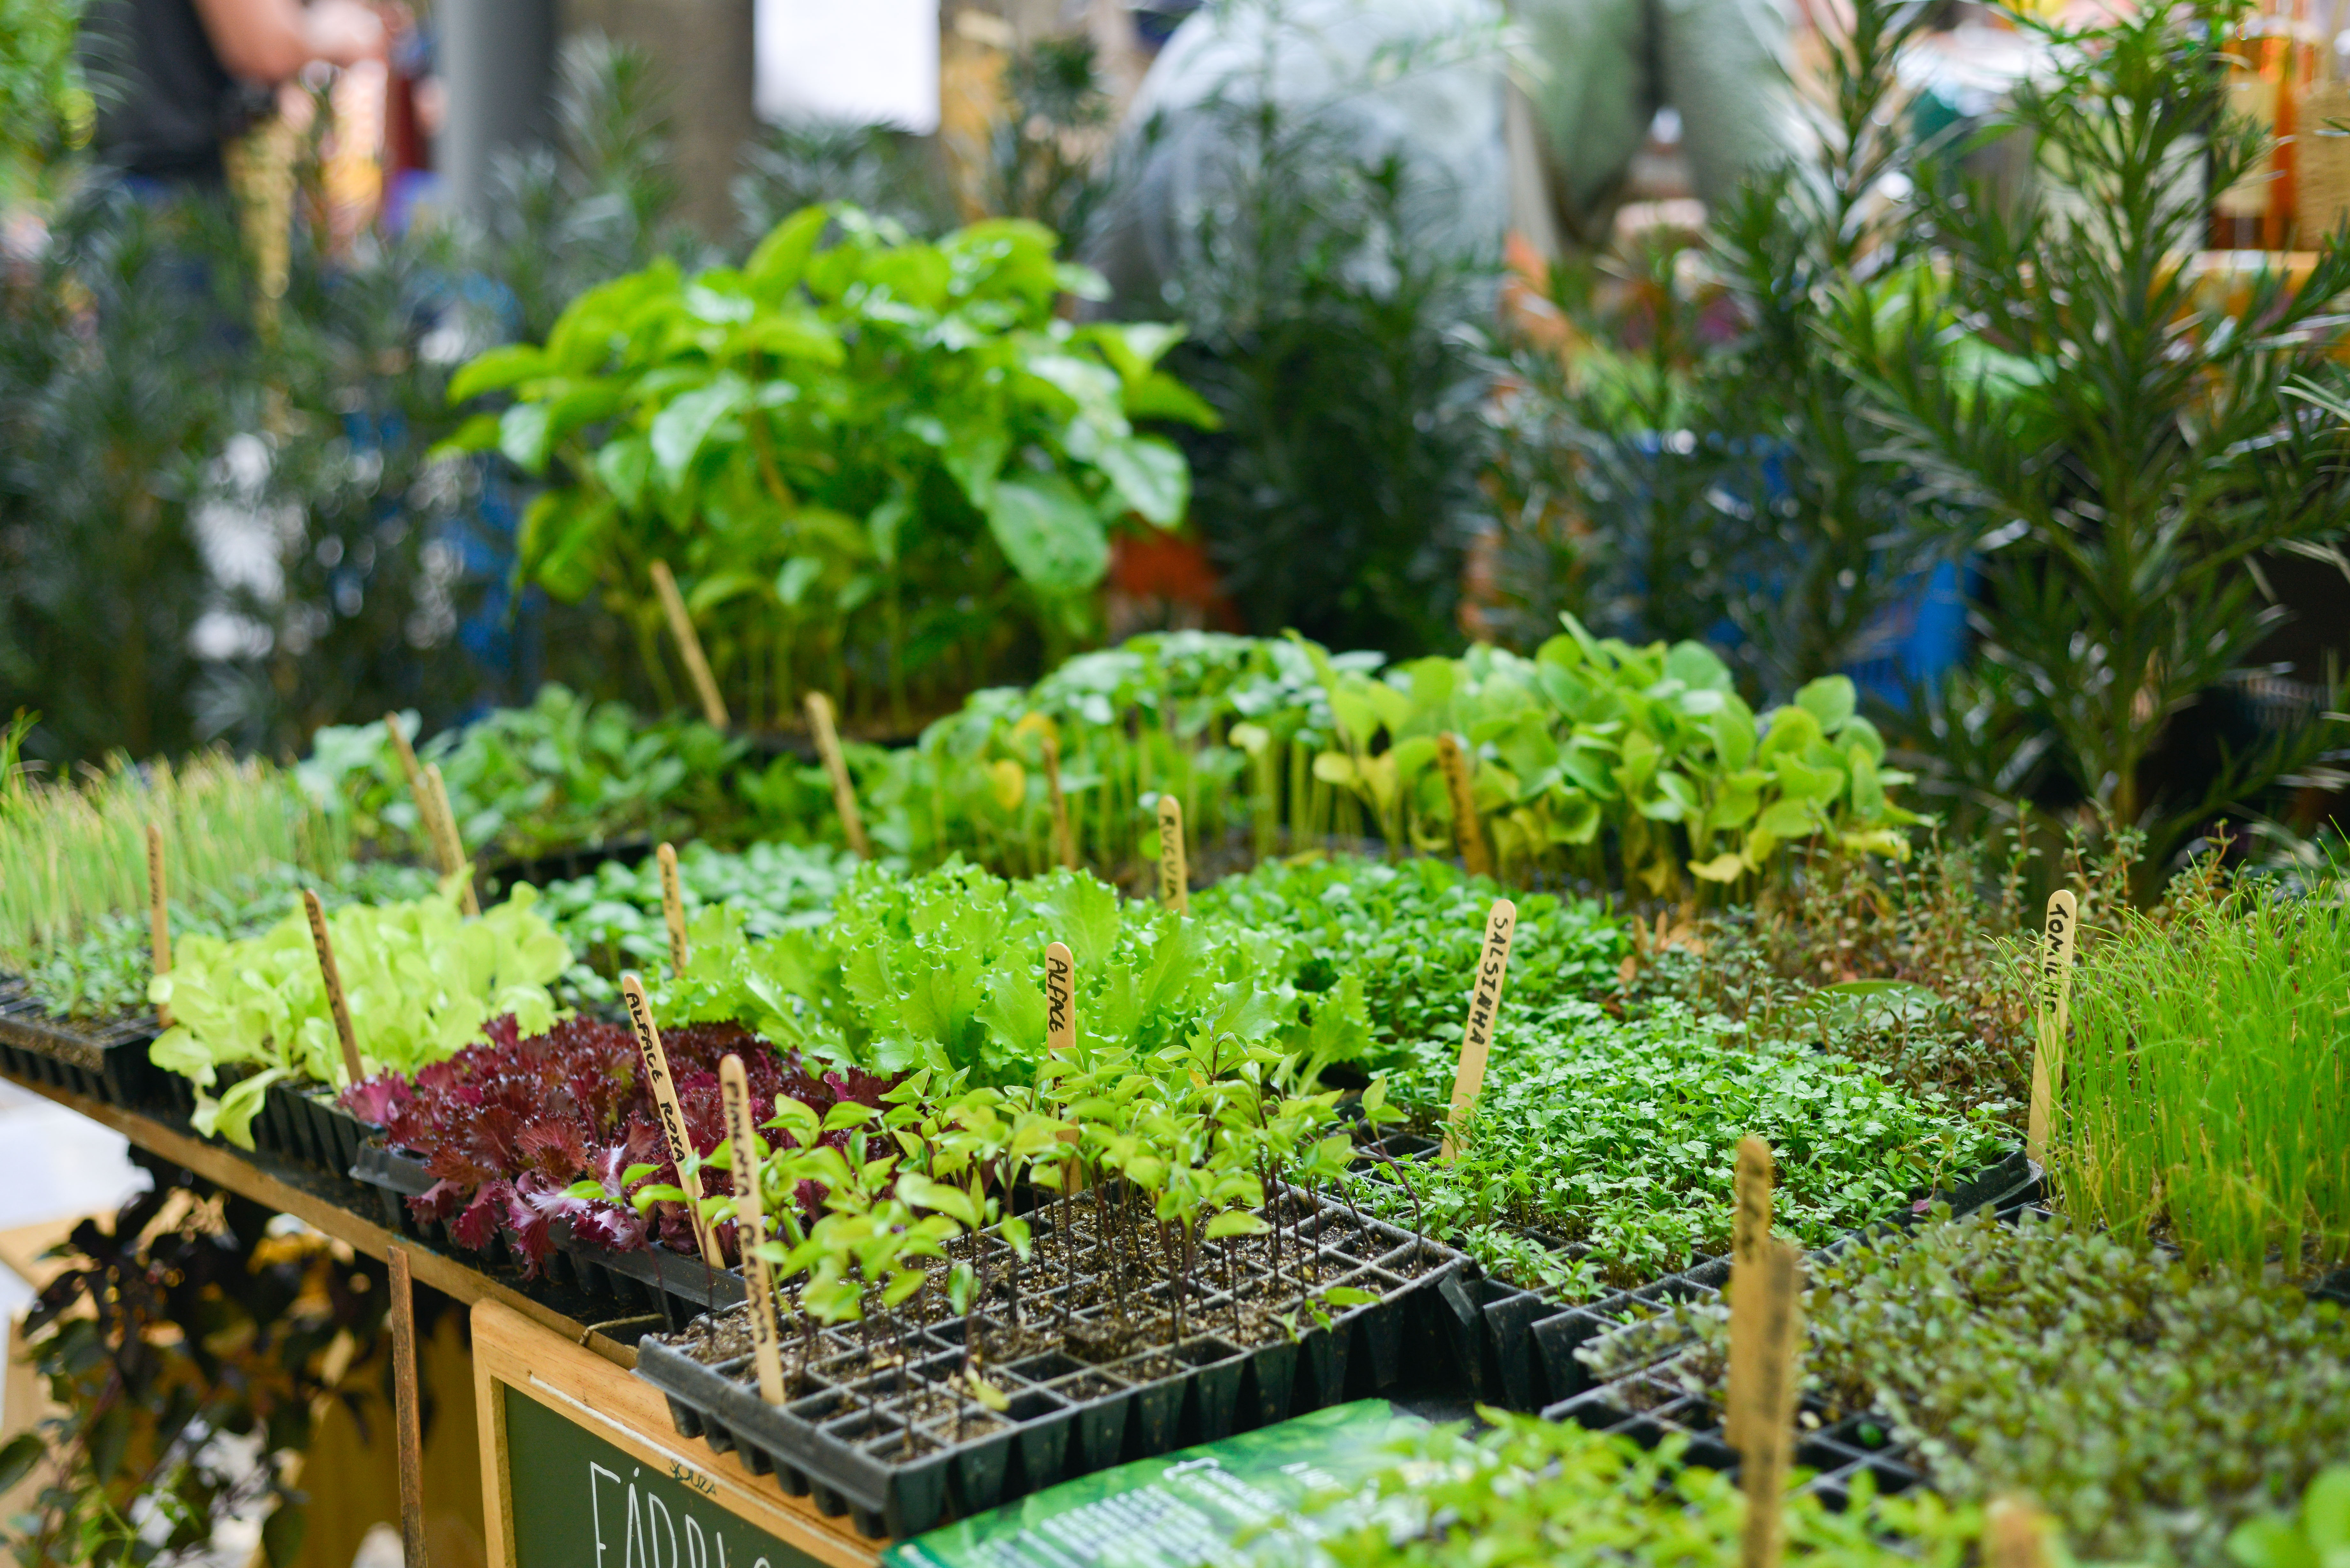 Fábrica de Hortas na Feira Fresca Green Up Savassi